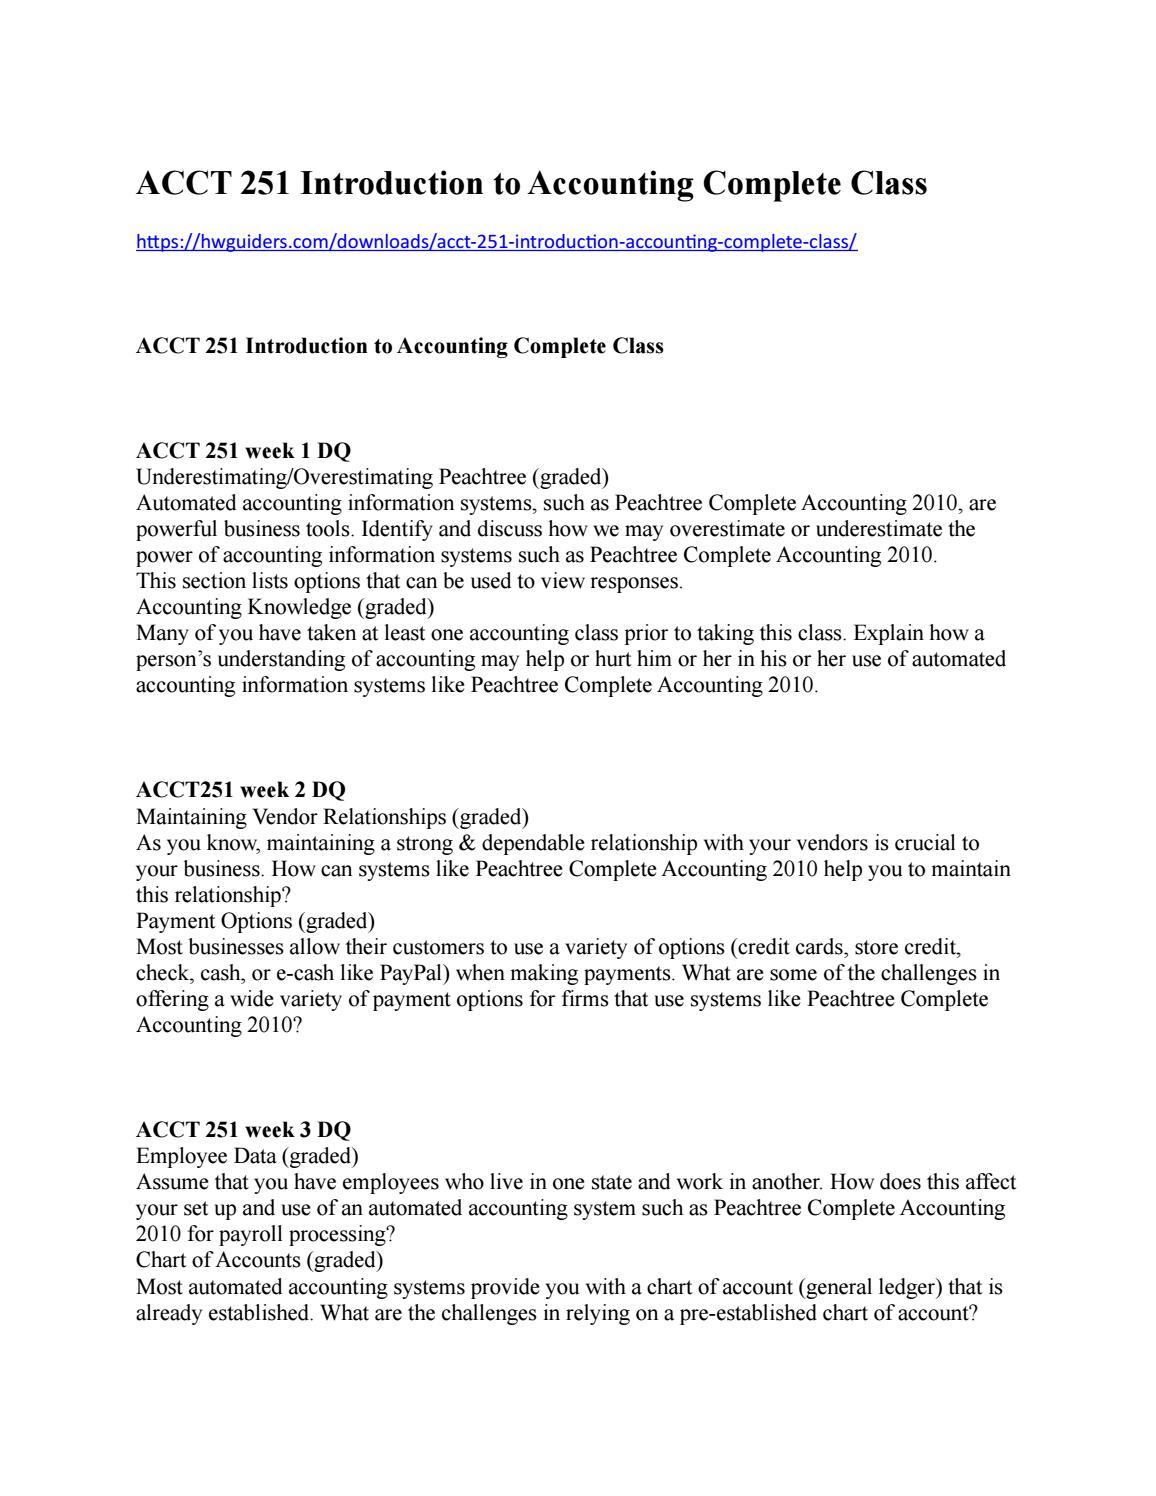 Dissertation editing services uk 020